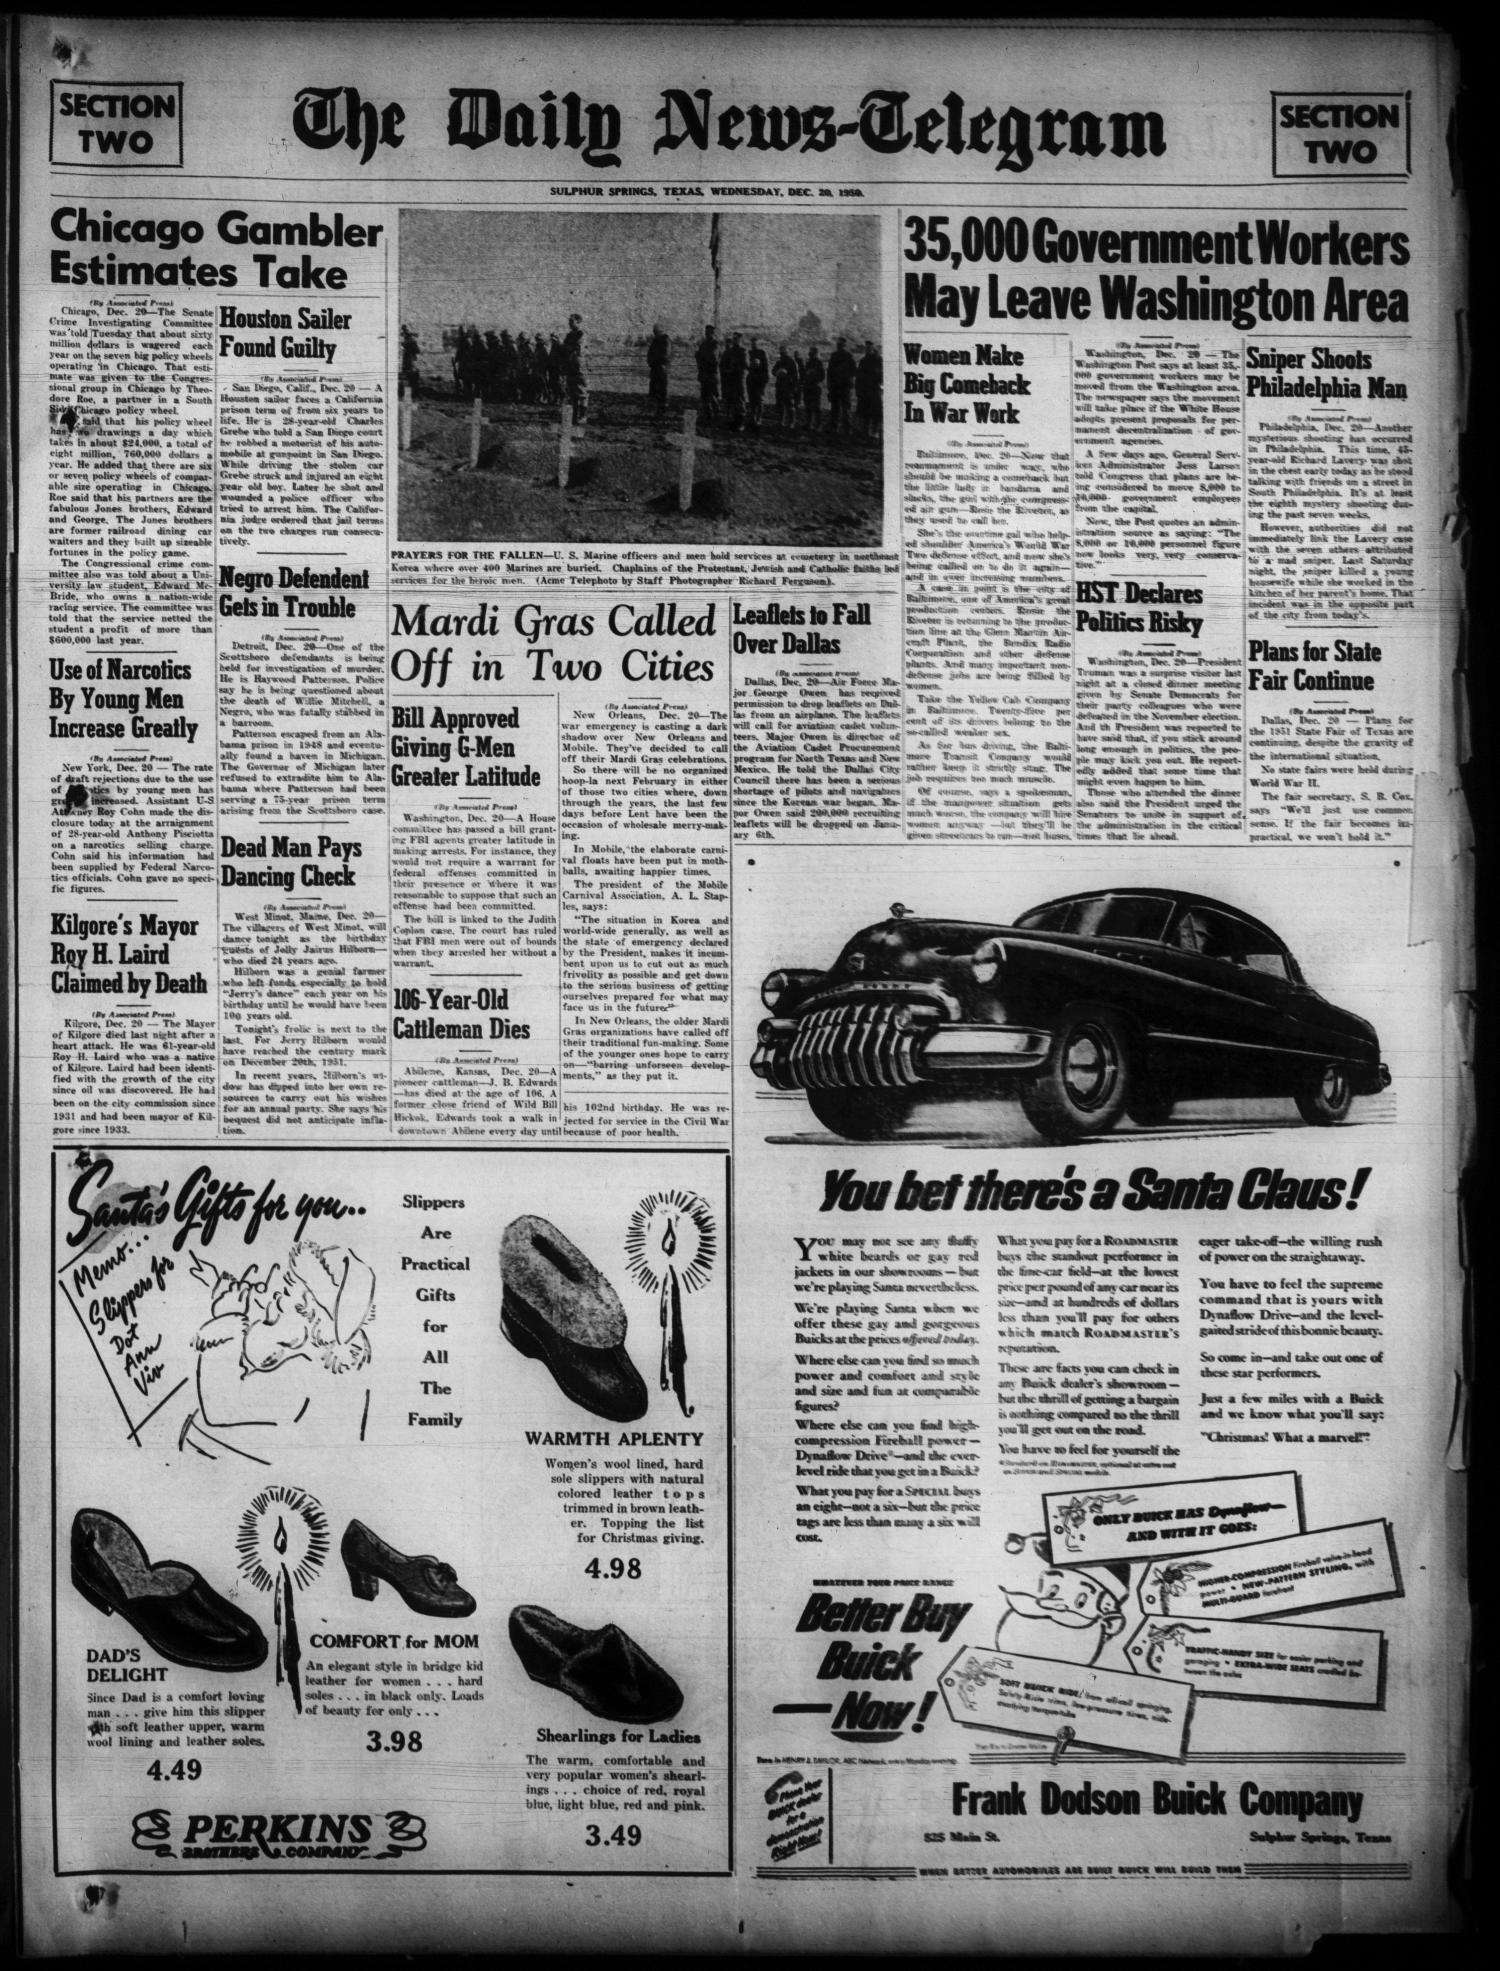 The Daily News-Telegram (Sulphur Springs, Tex ), Vol  52, No